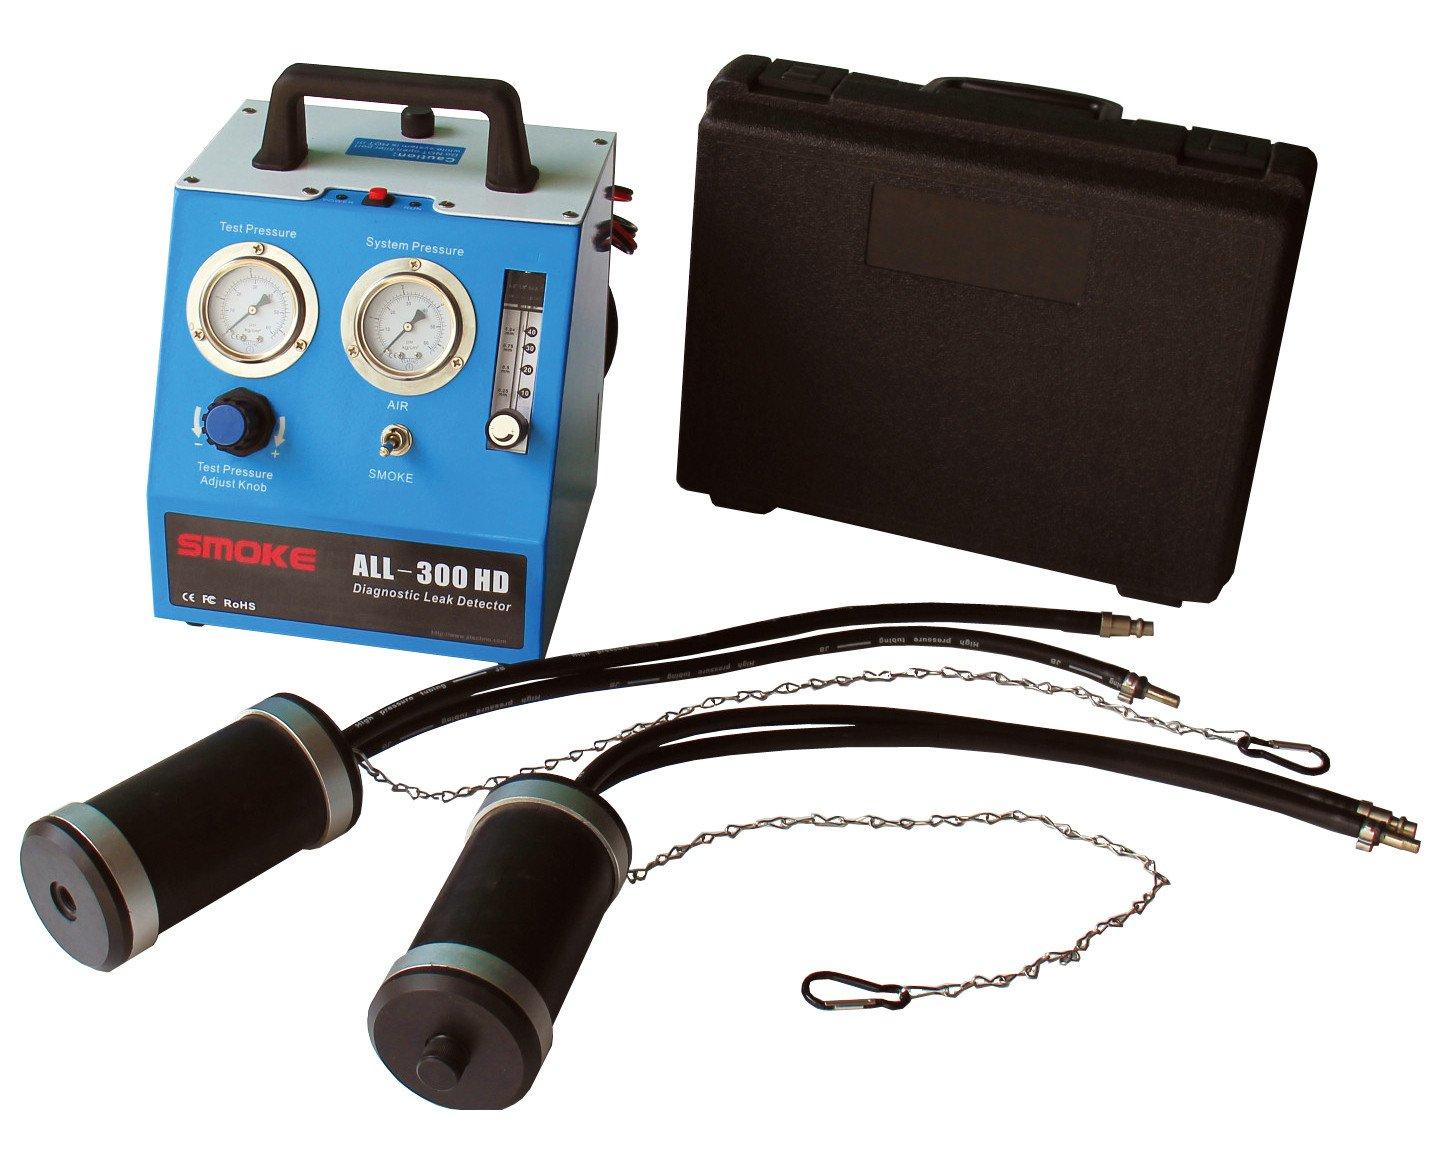 Amazon.com: ALL-300 HD Diagnostic Leak Detector for Car/Heavy Duty Automotive Smoke Leak Locator (Heavy Duty): Automotive